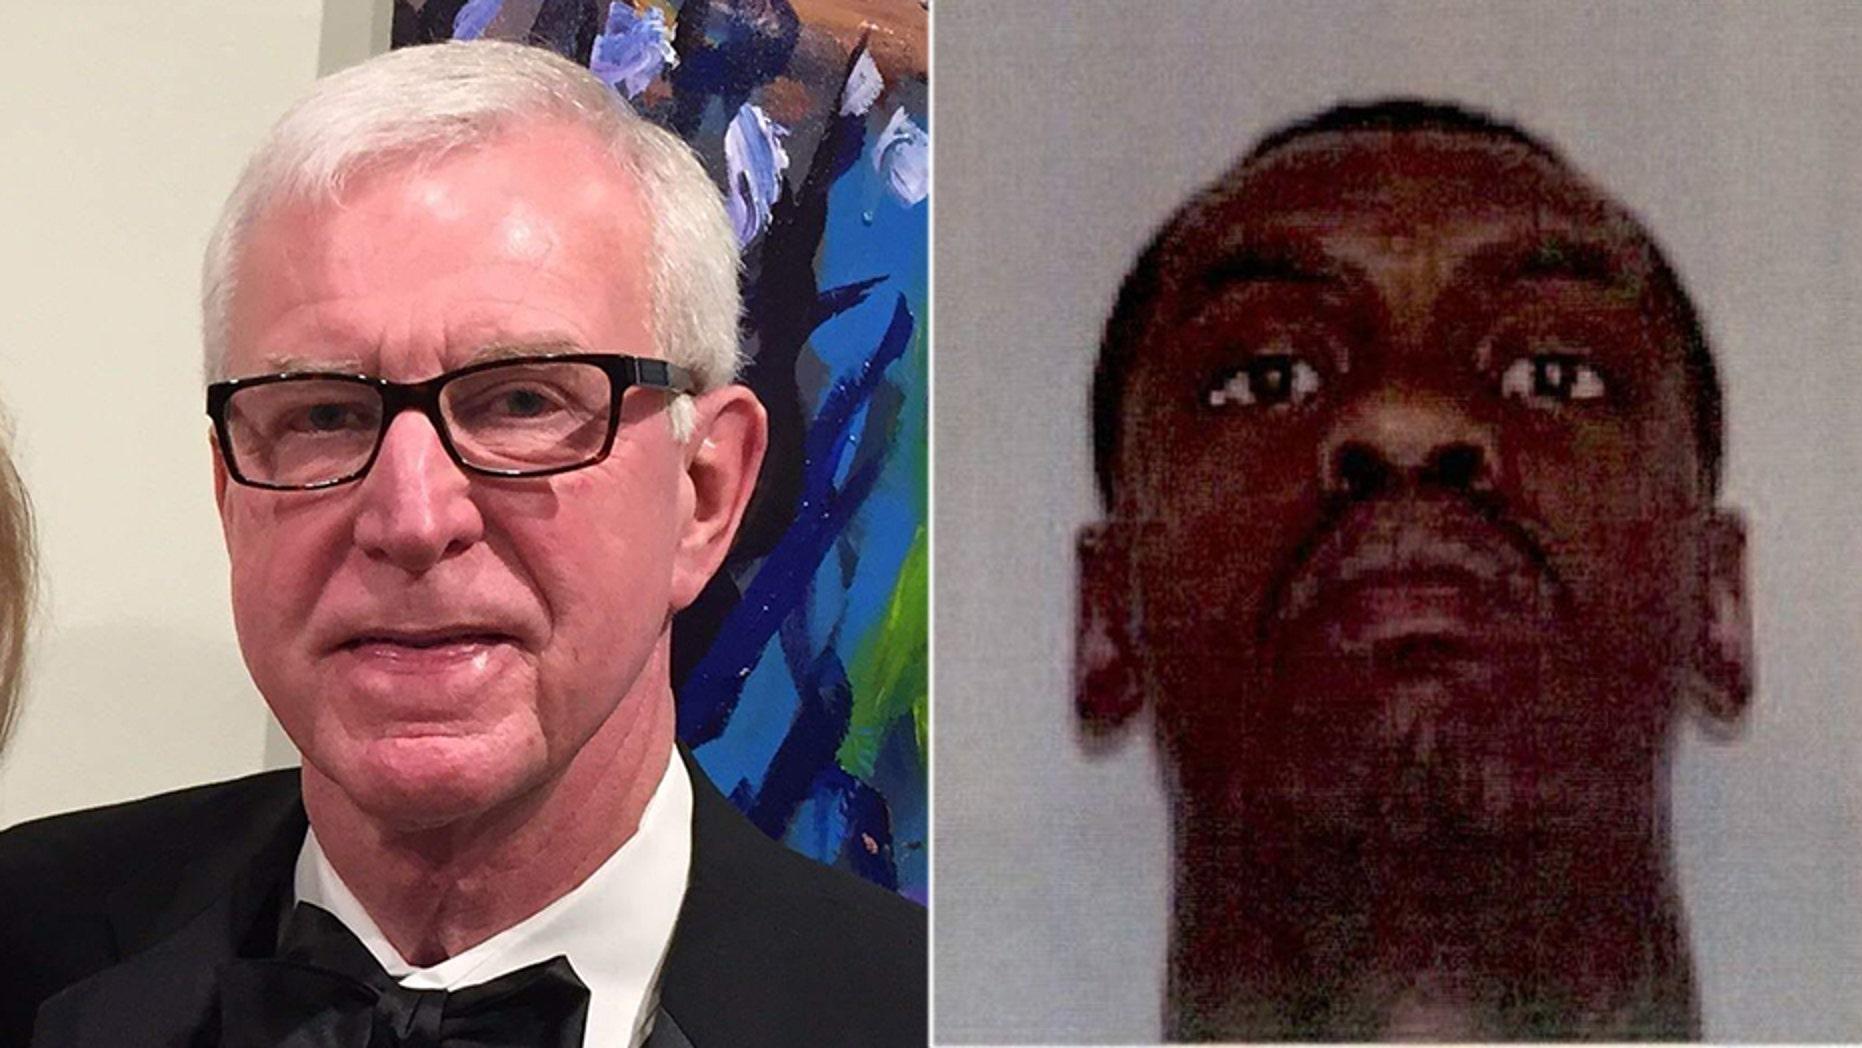 Philanthropist and businessman Jack Hough, 73, (left), was shot dead on Thursday in Gainesville, Georgia. The police detained DeMarvin Bennett, 24, on Thursday for murder.